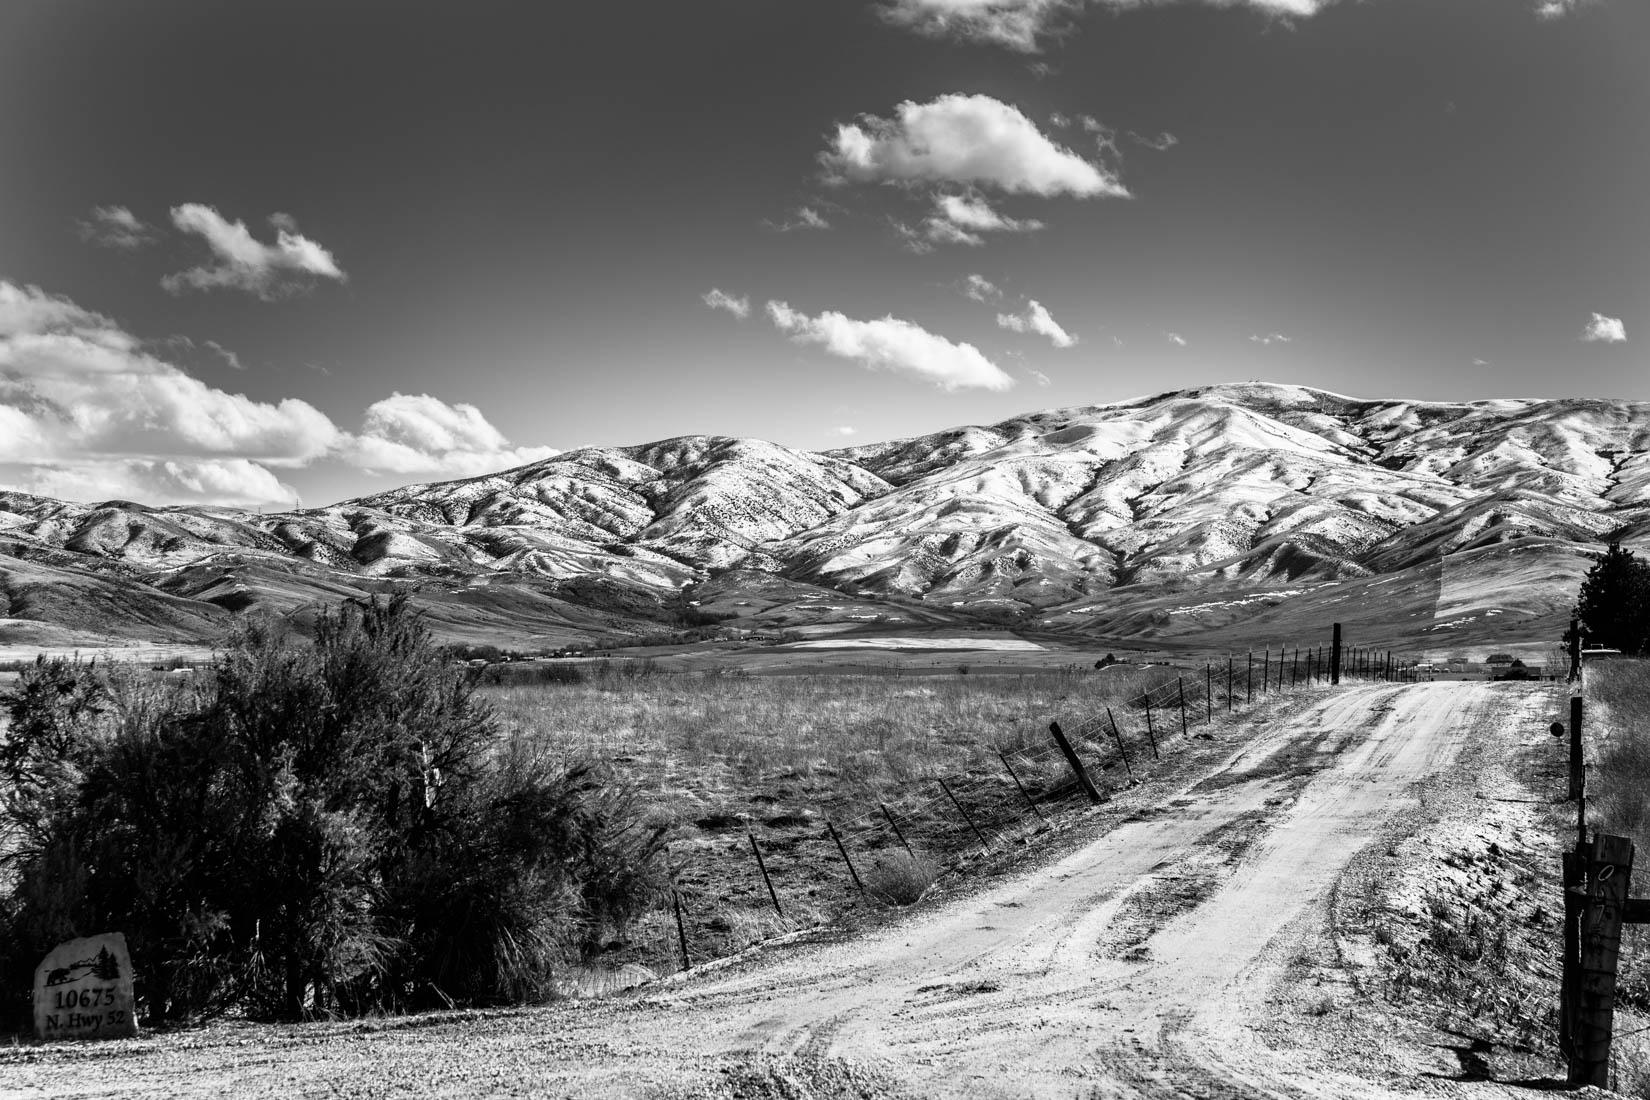 Idaho Hills and prairies in Emmett and Horseshoe Bend